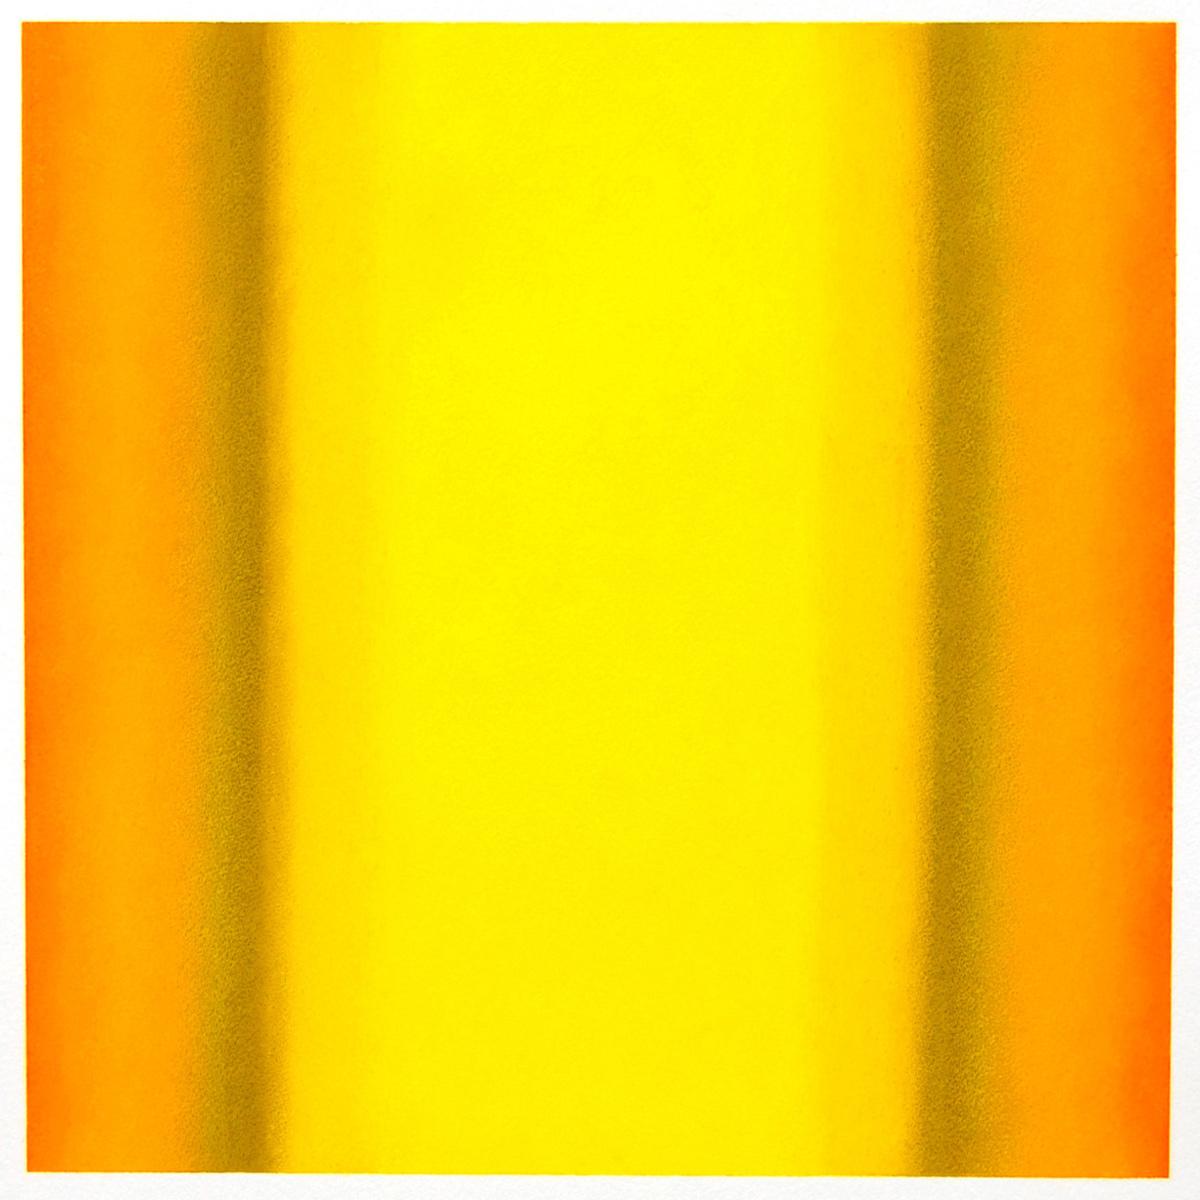 Warm-Light Yellow-Orange-Ochre, Interplay Series, 2012, pastel on paper, image: 14 x 14 in. (36 x 36 cm.), sheet: 30 x 22 in. (76 x 56 cm.)